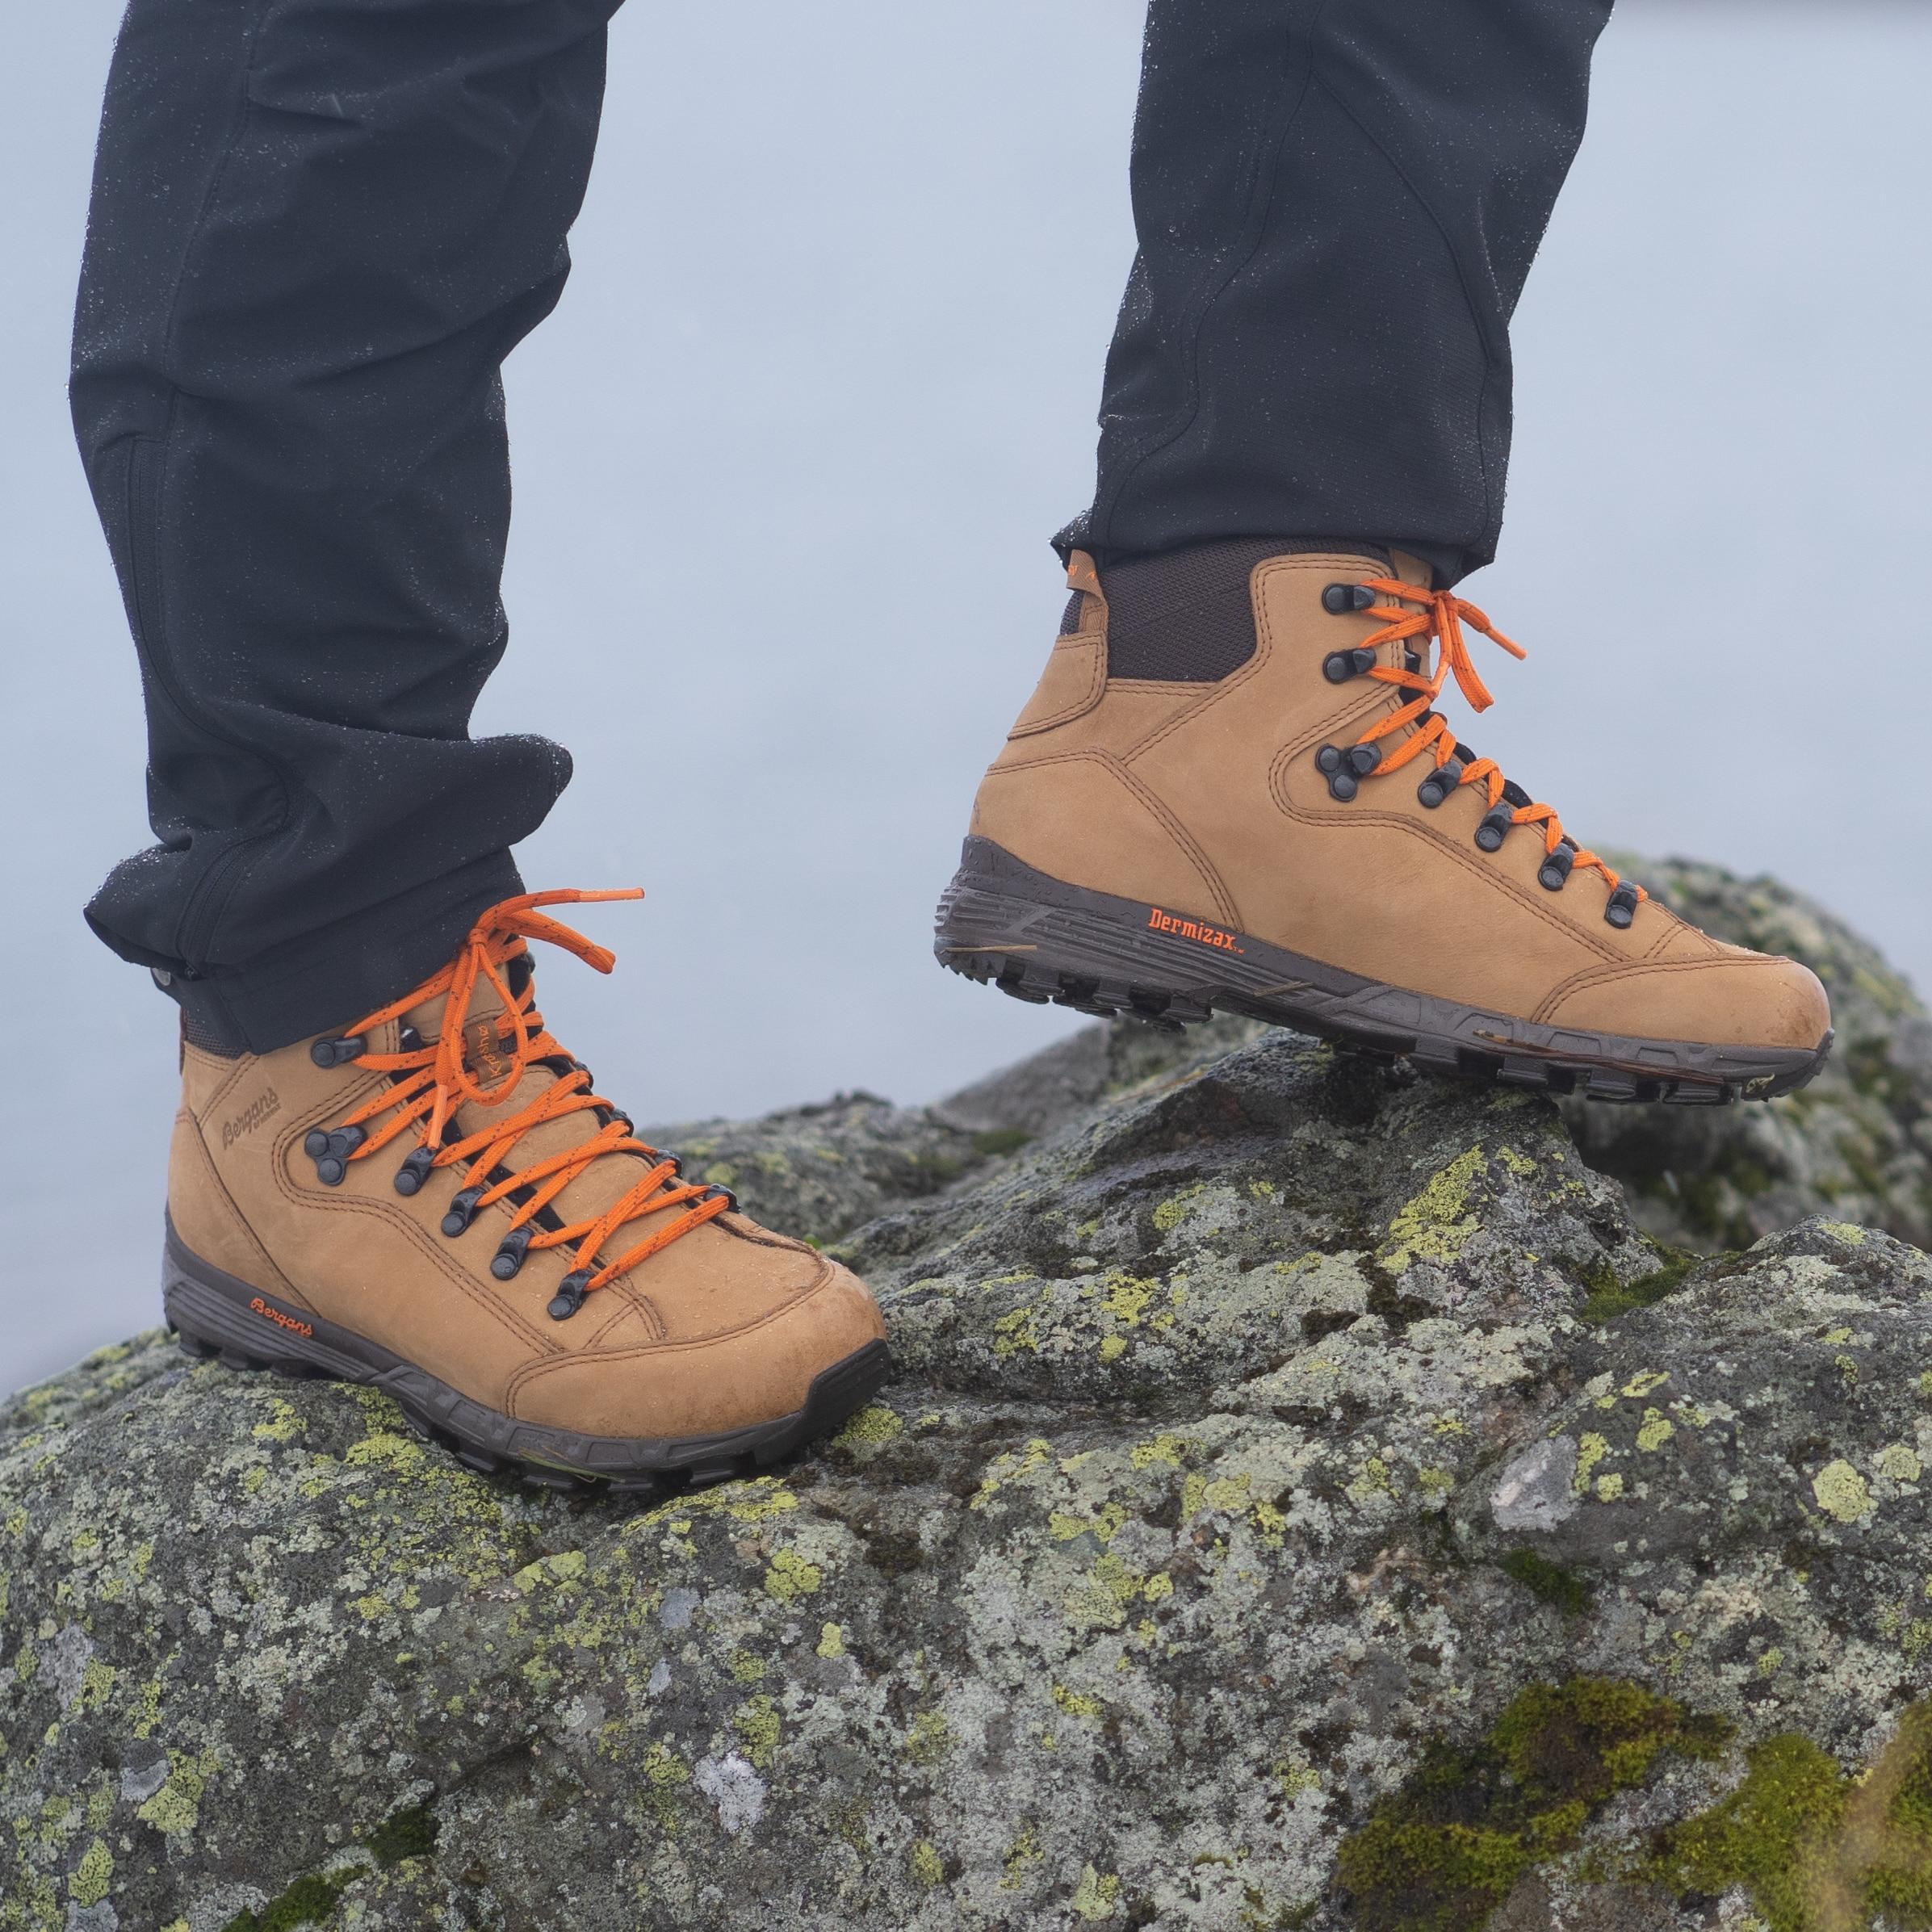 Krosshø Lady Trekking Boot